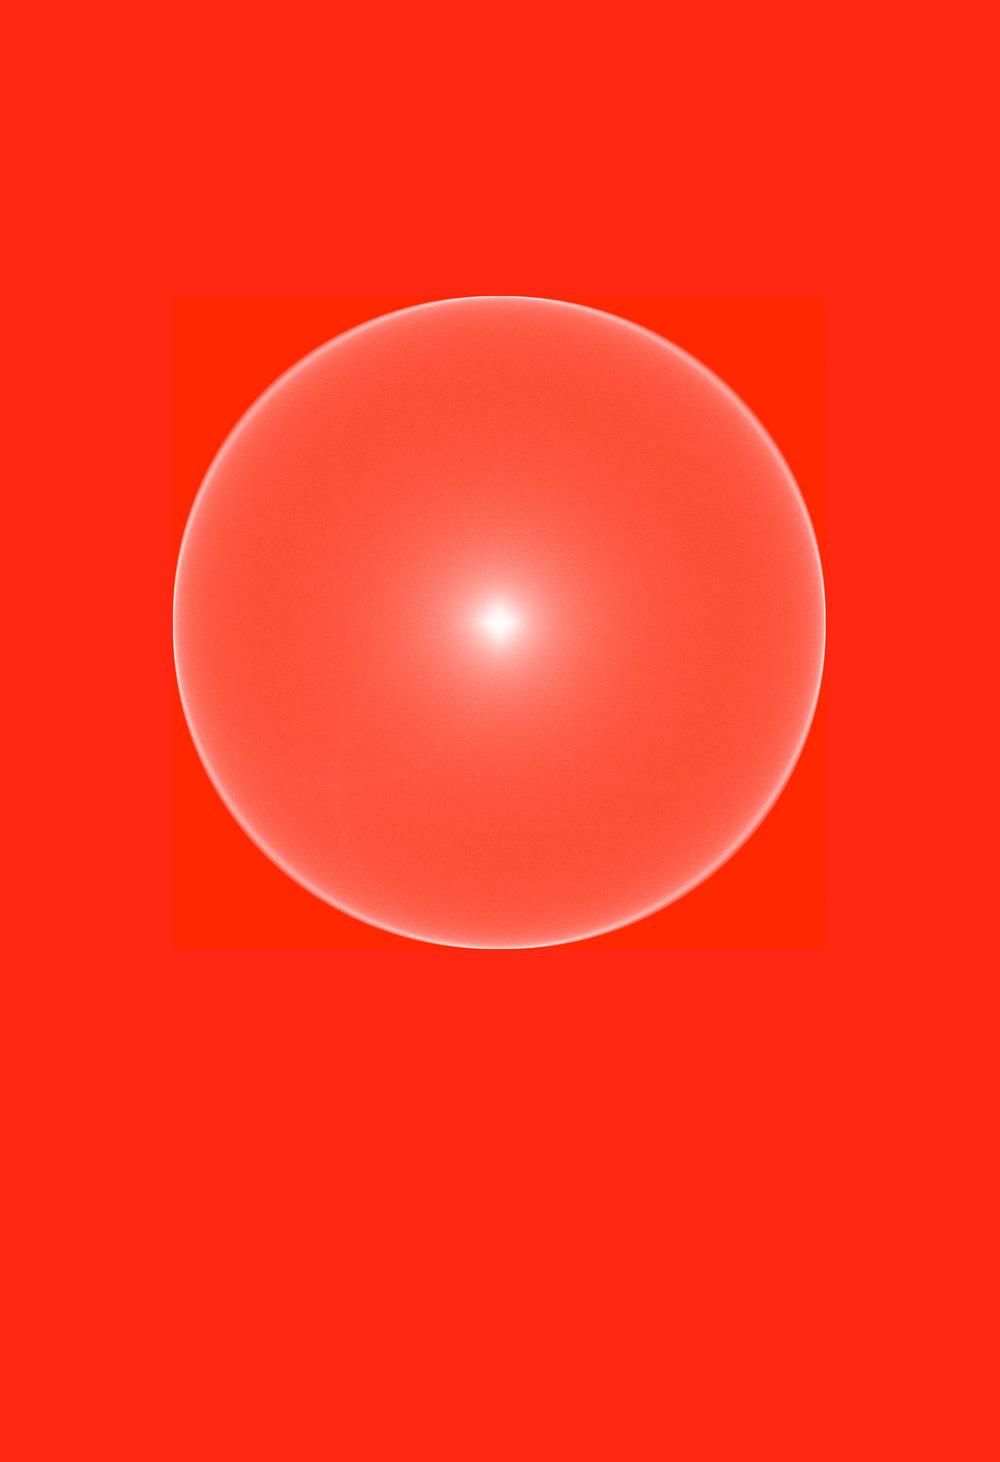 radiant spot (jaclyn hull)